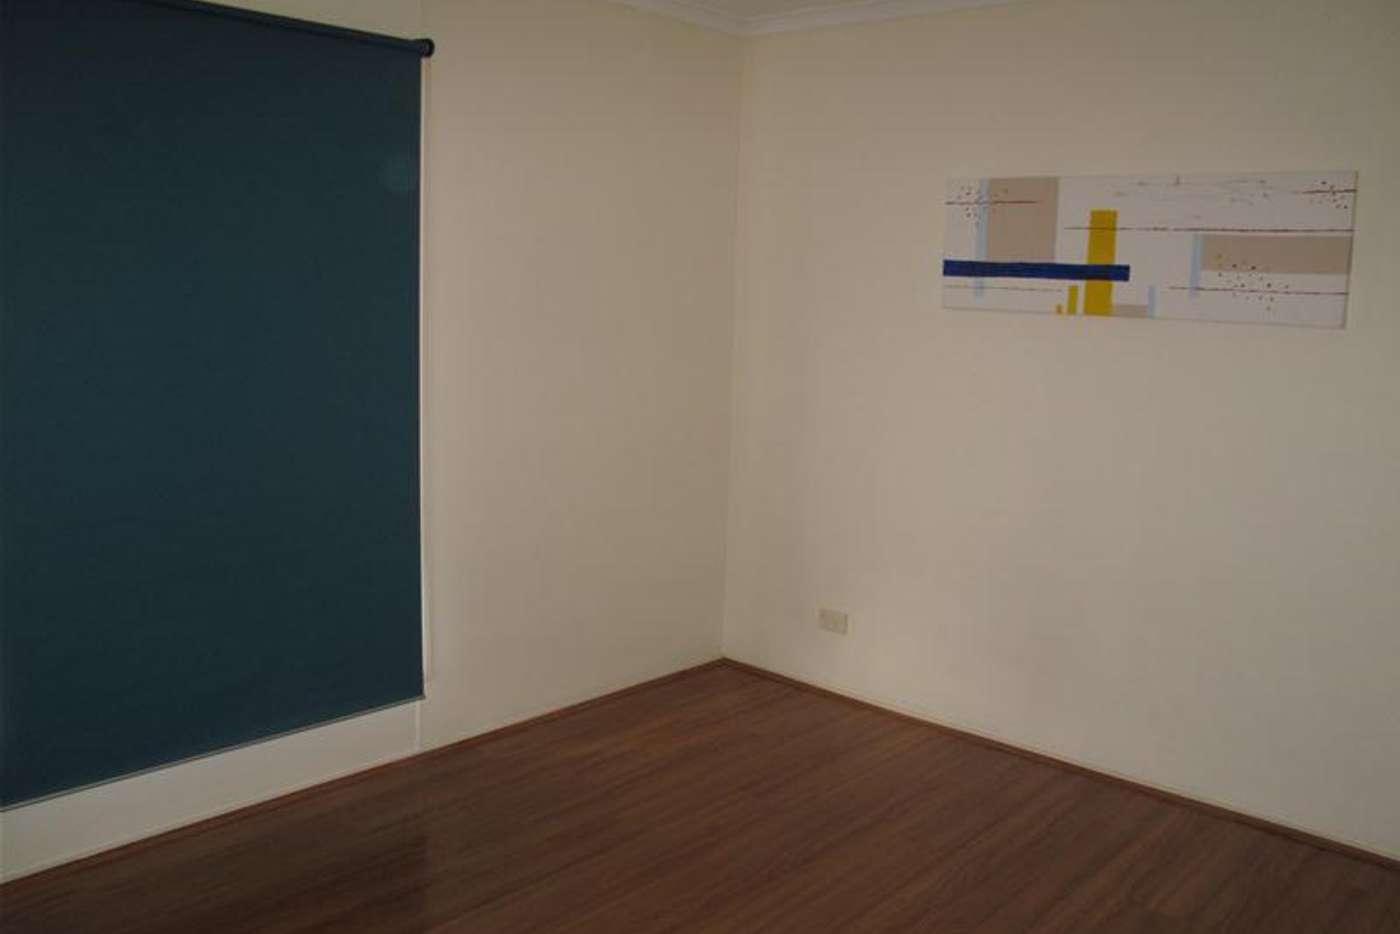 Fifth view of Homely house listing, 18 Kona Crescent, Edithburgh SA 5583